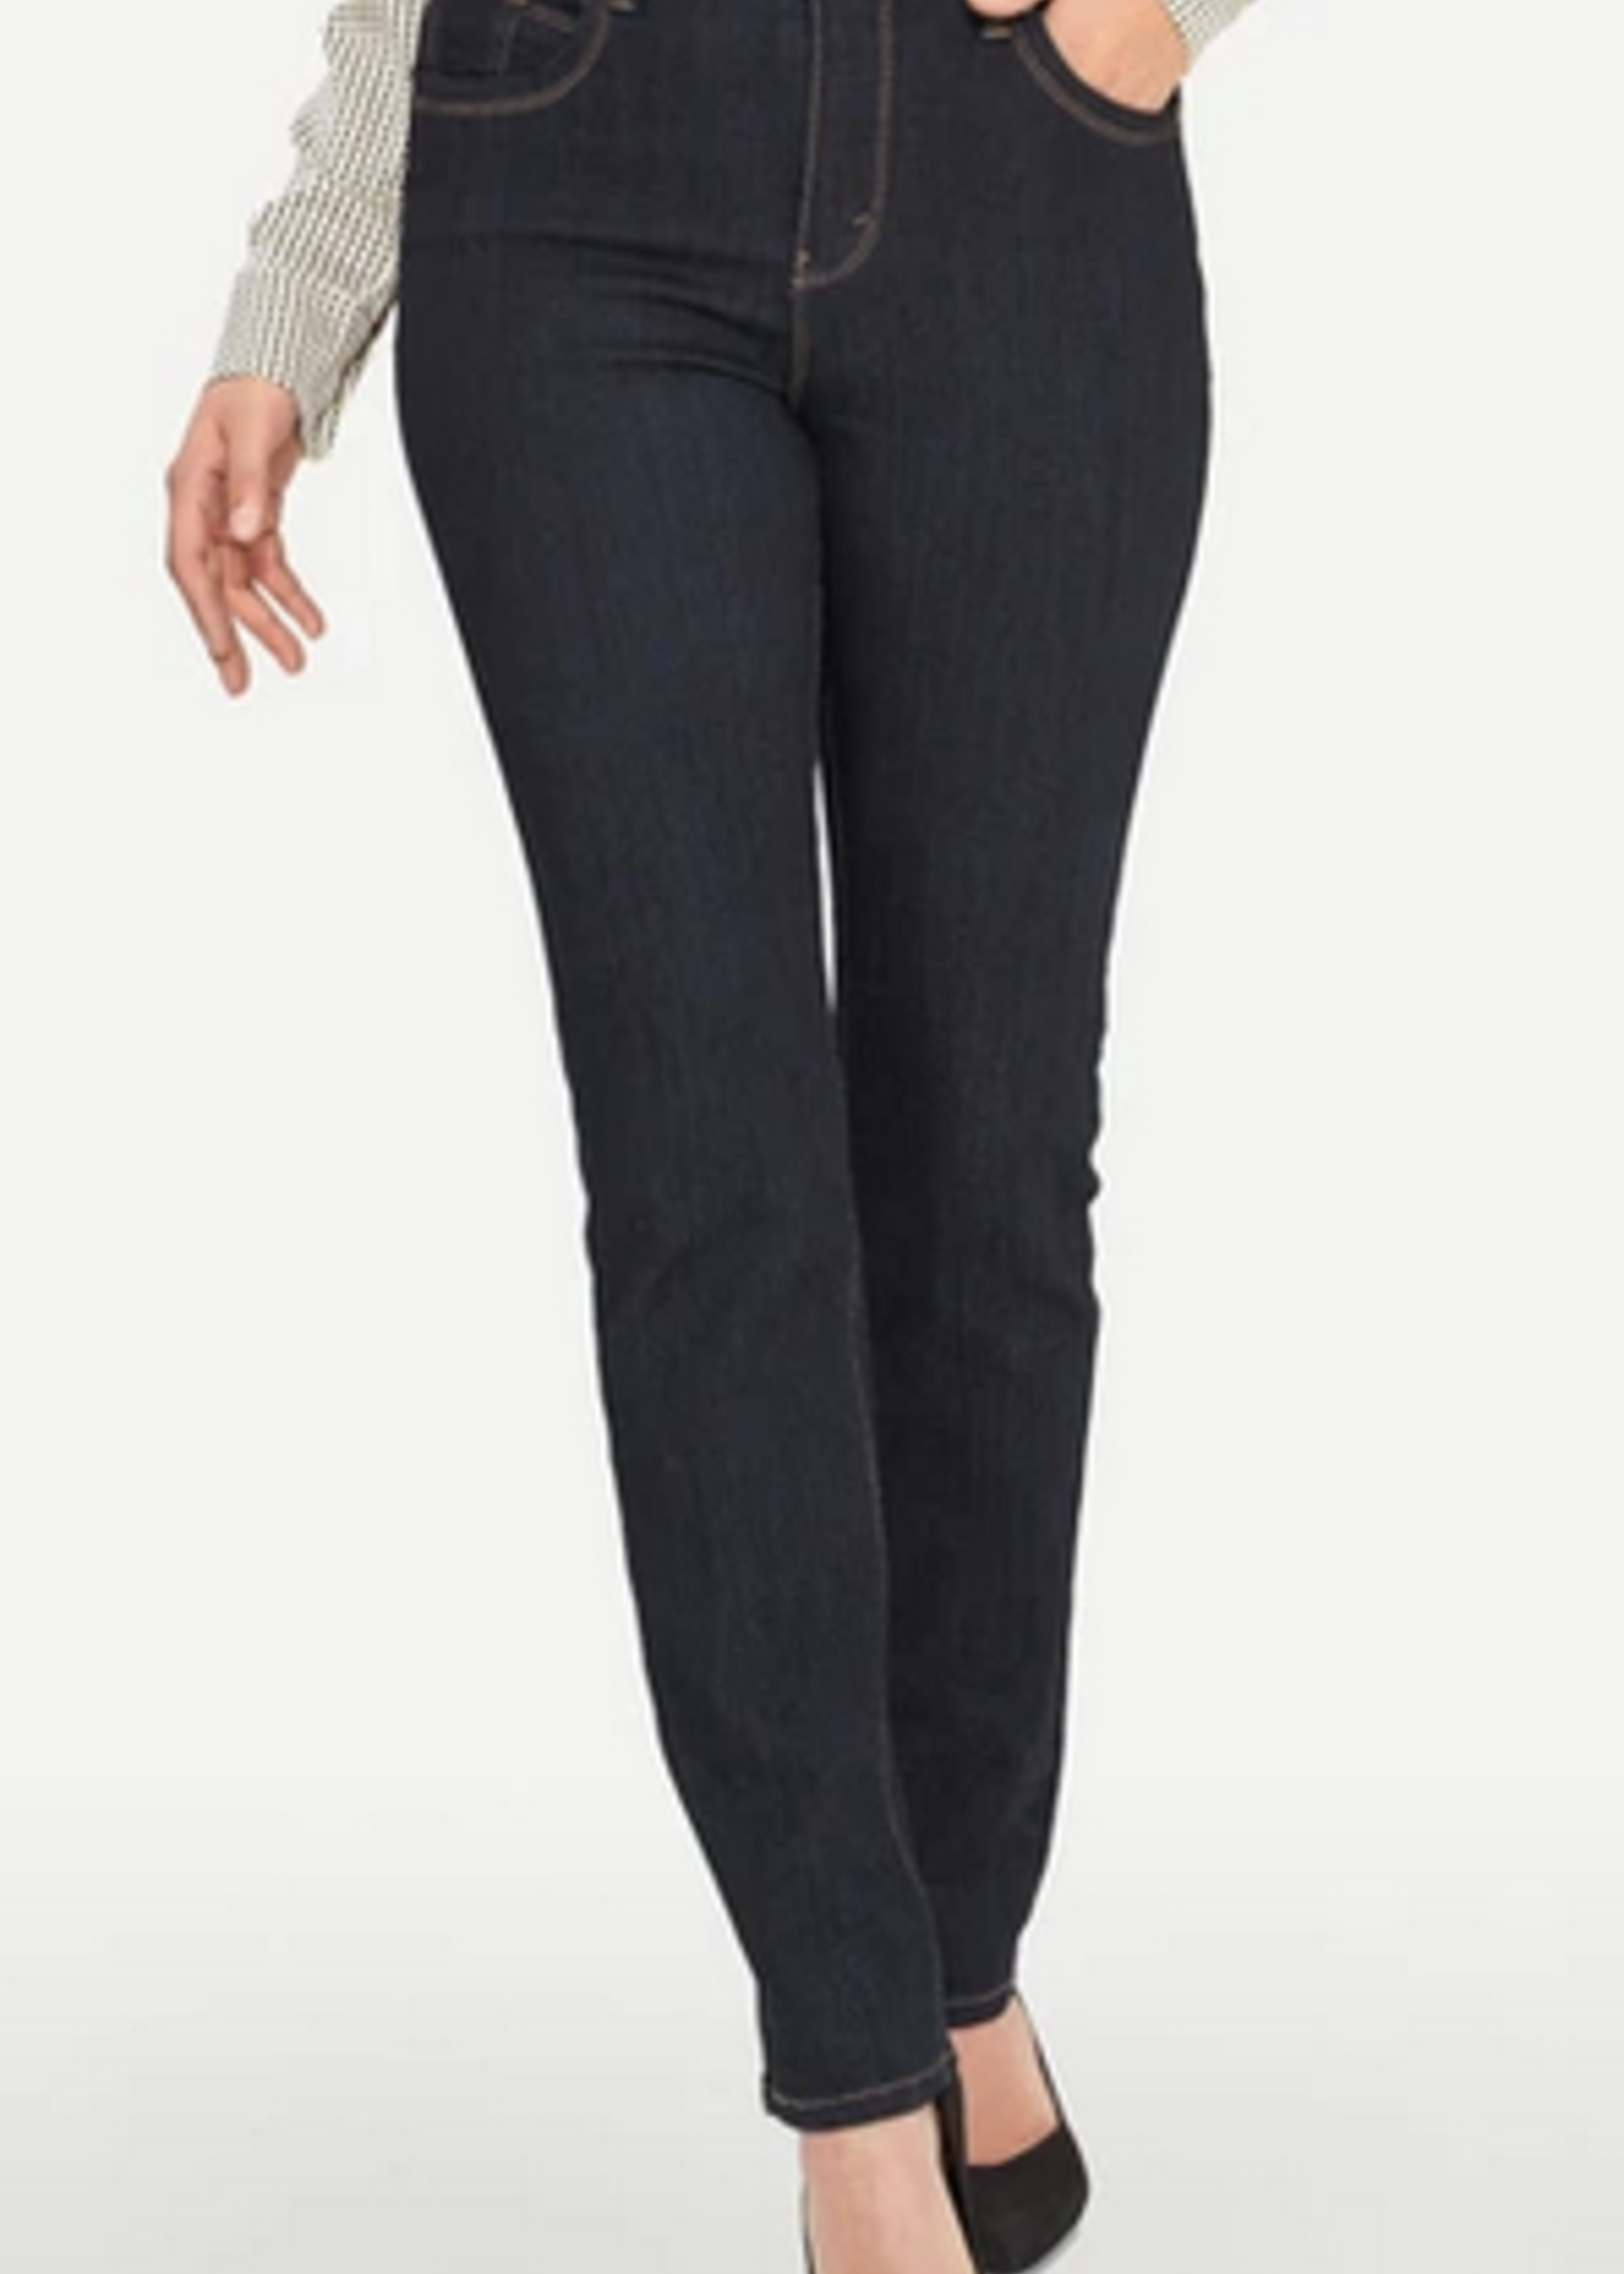 Lois GiGi Jeans